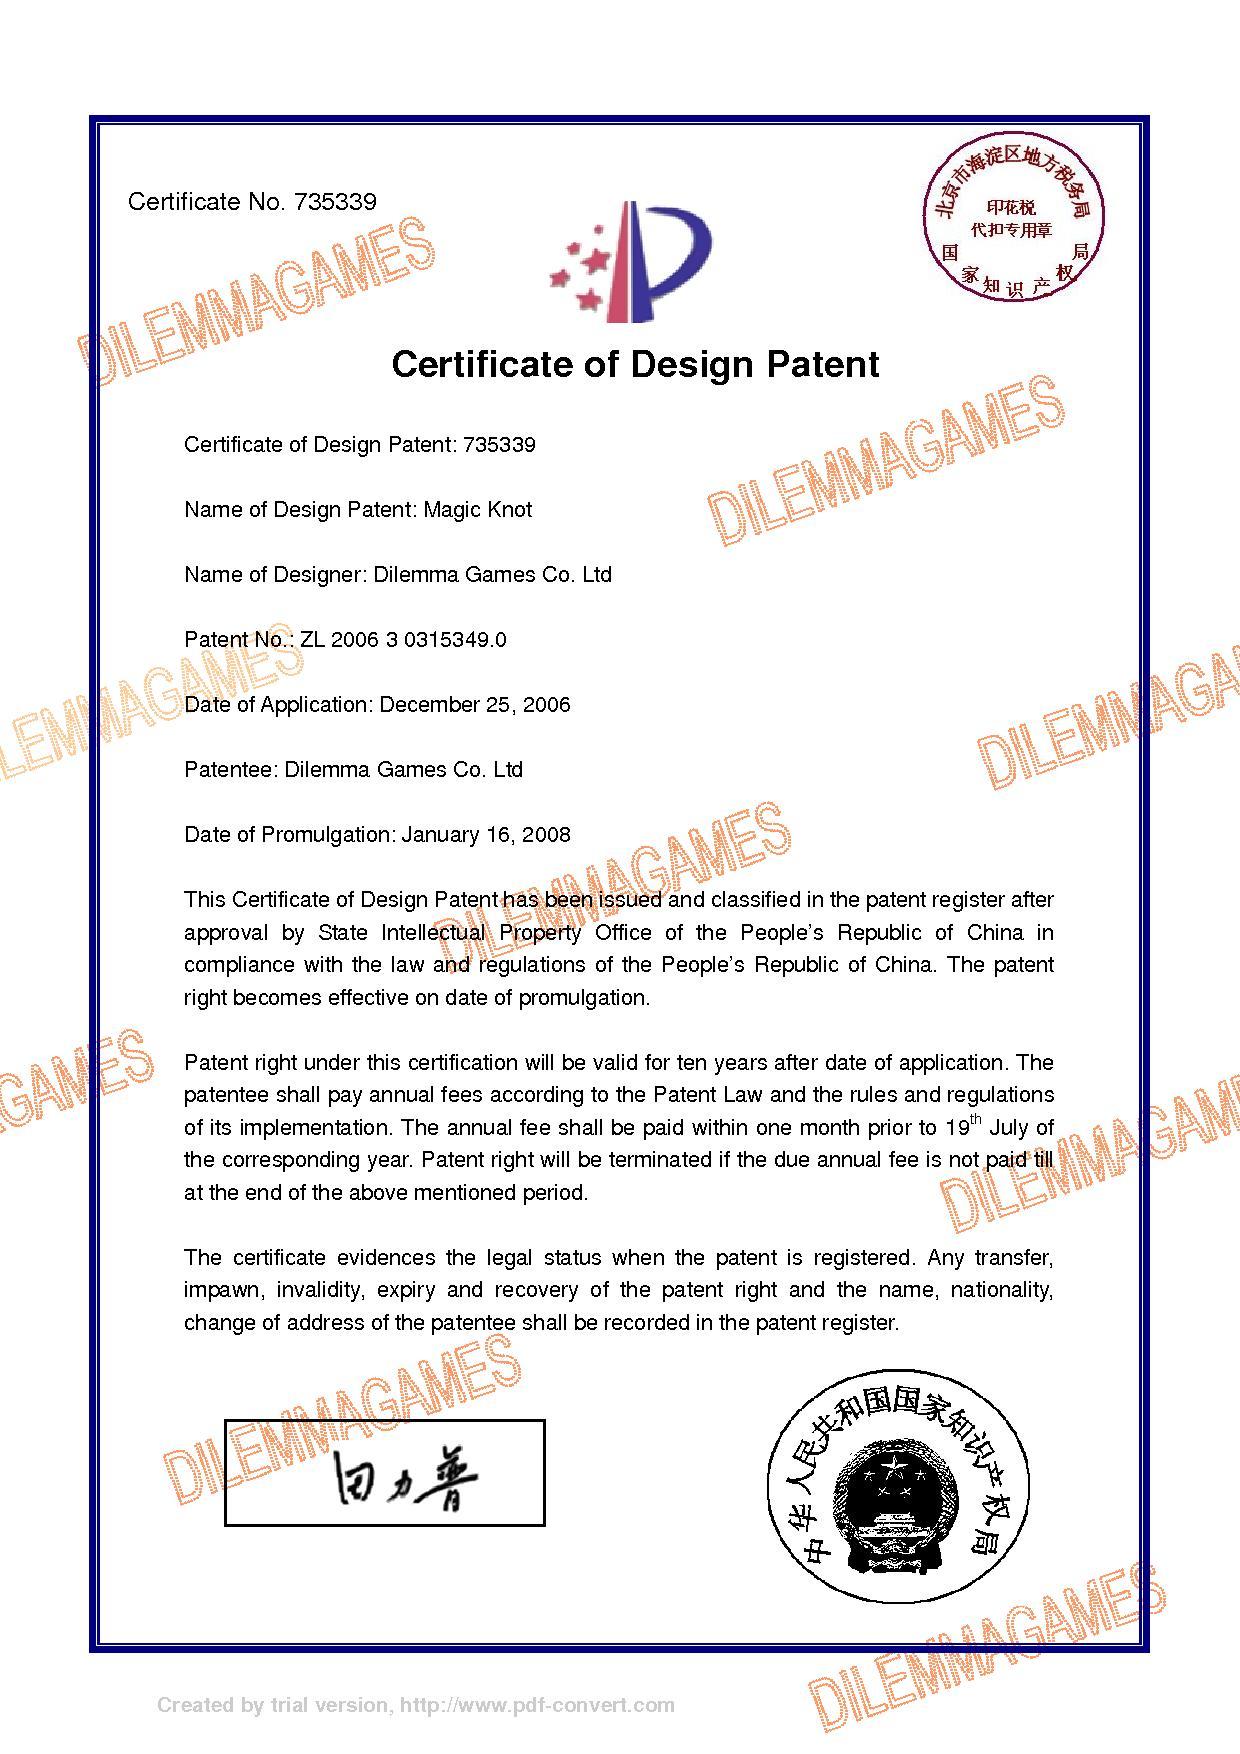 Dilemma Games Co Ltd Patent Invention